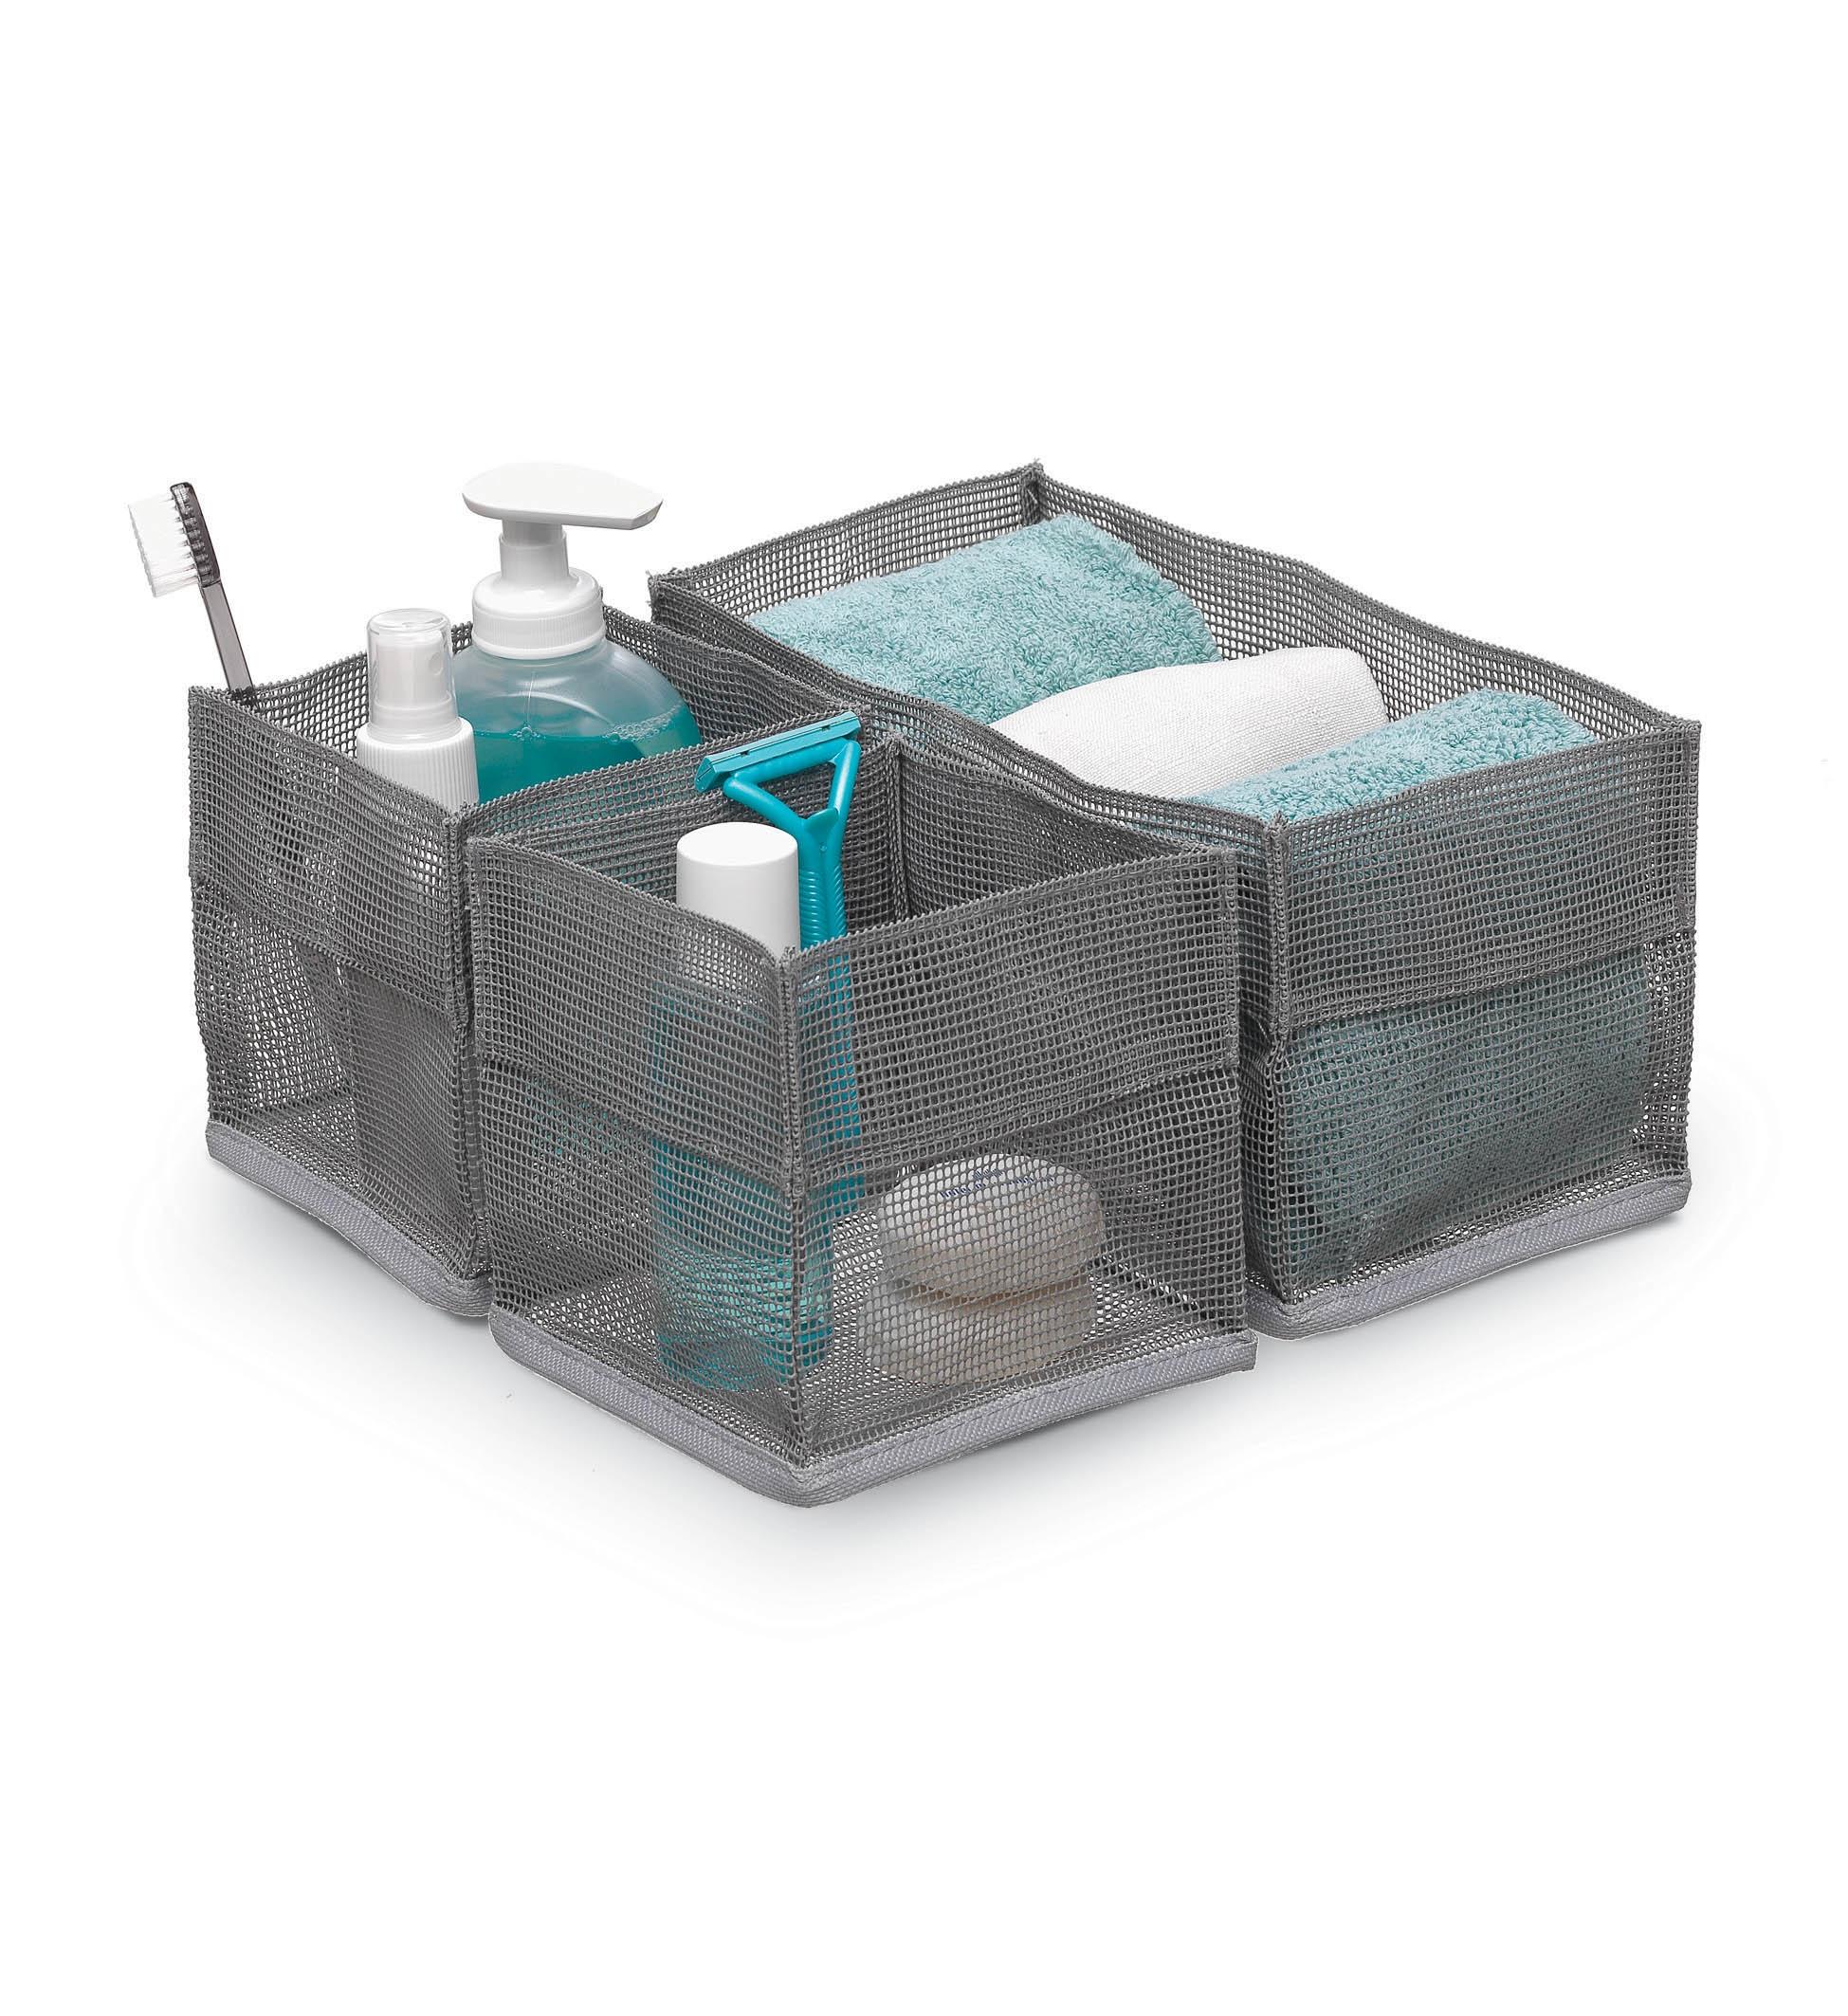 Set 3 organizatoare pentru cosmetice Bagno Gri / Alb, Modele Asortate, L12xl12xH12 cm / L24xl12xH12 cm imagine